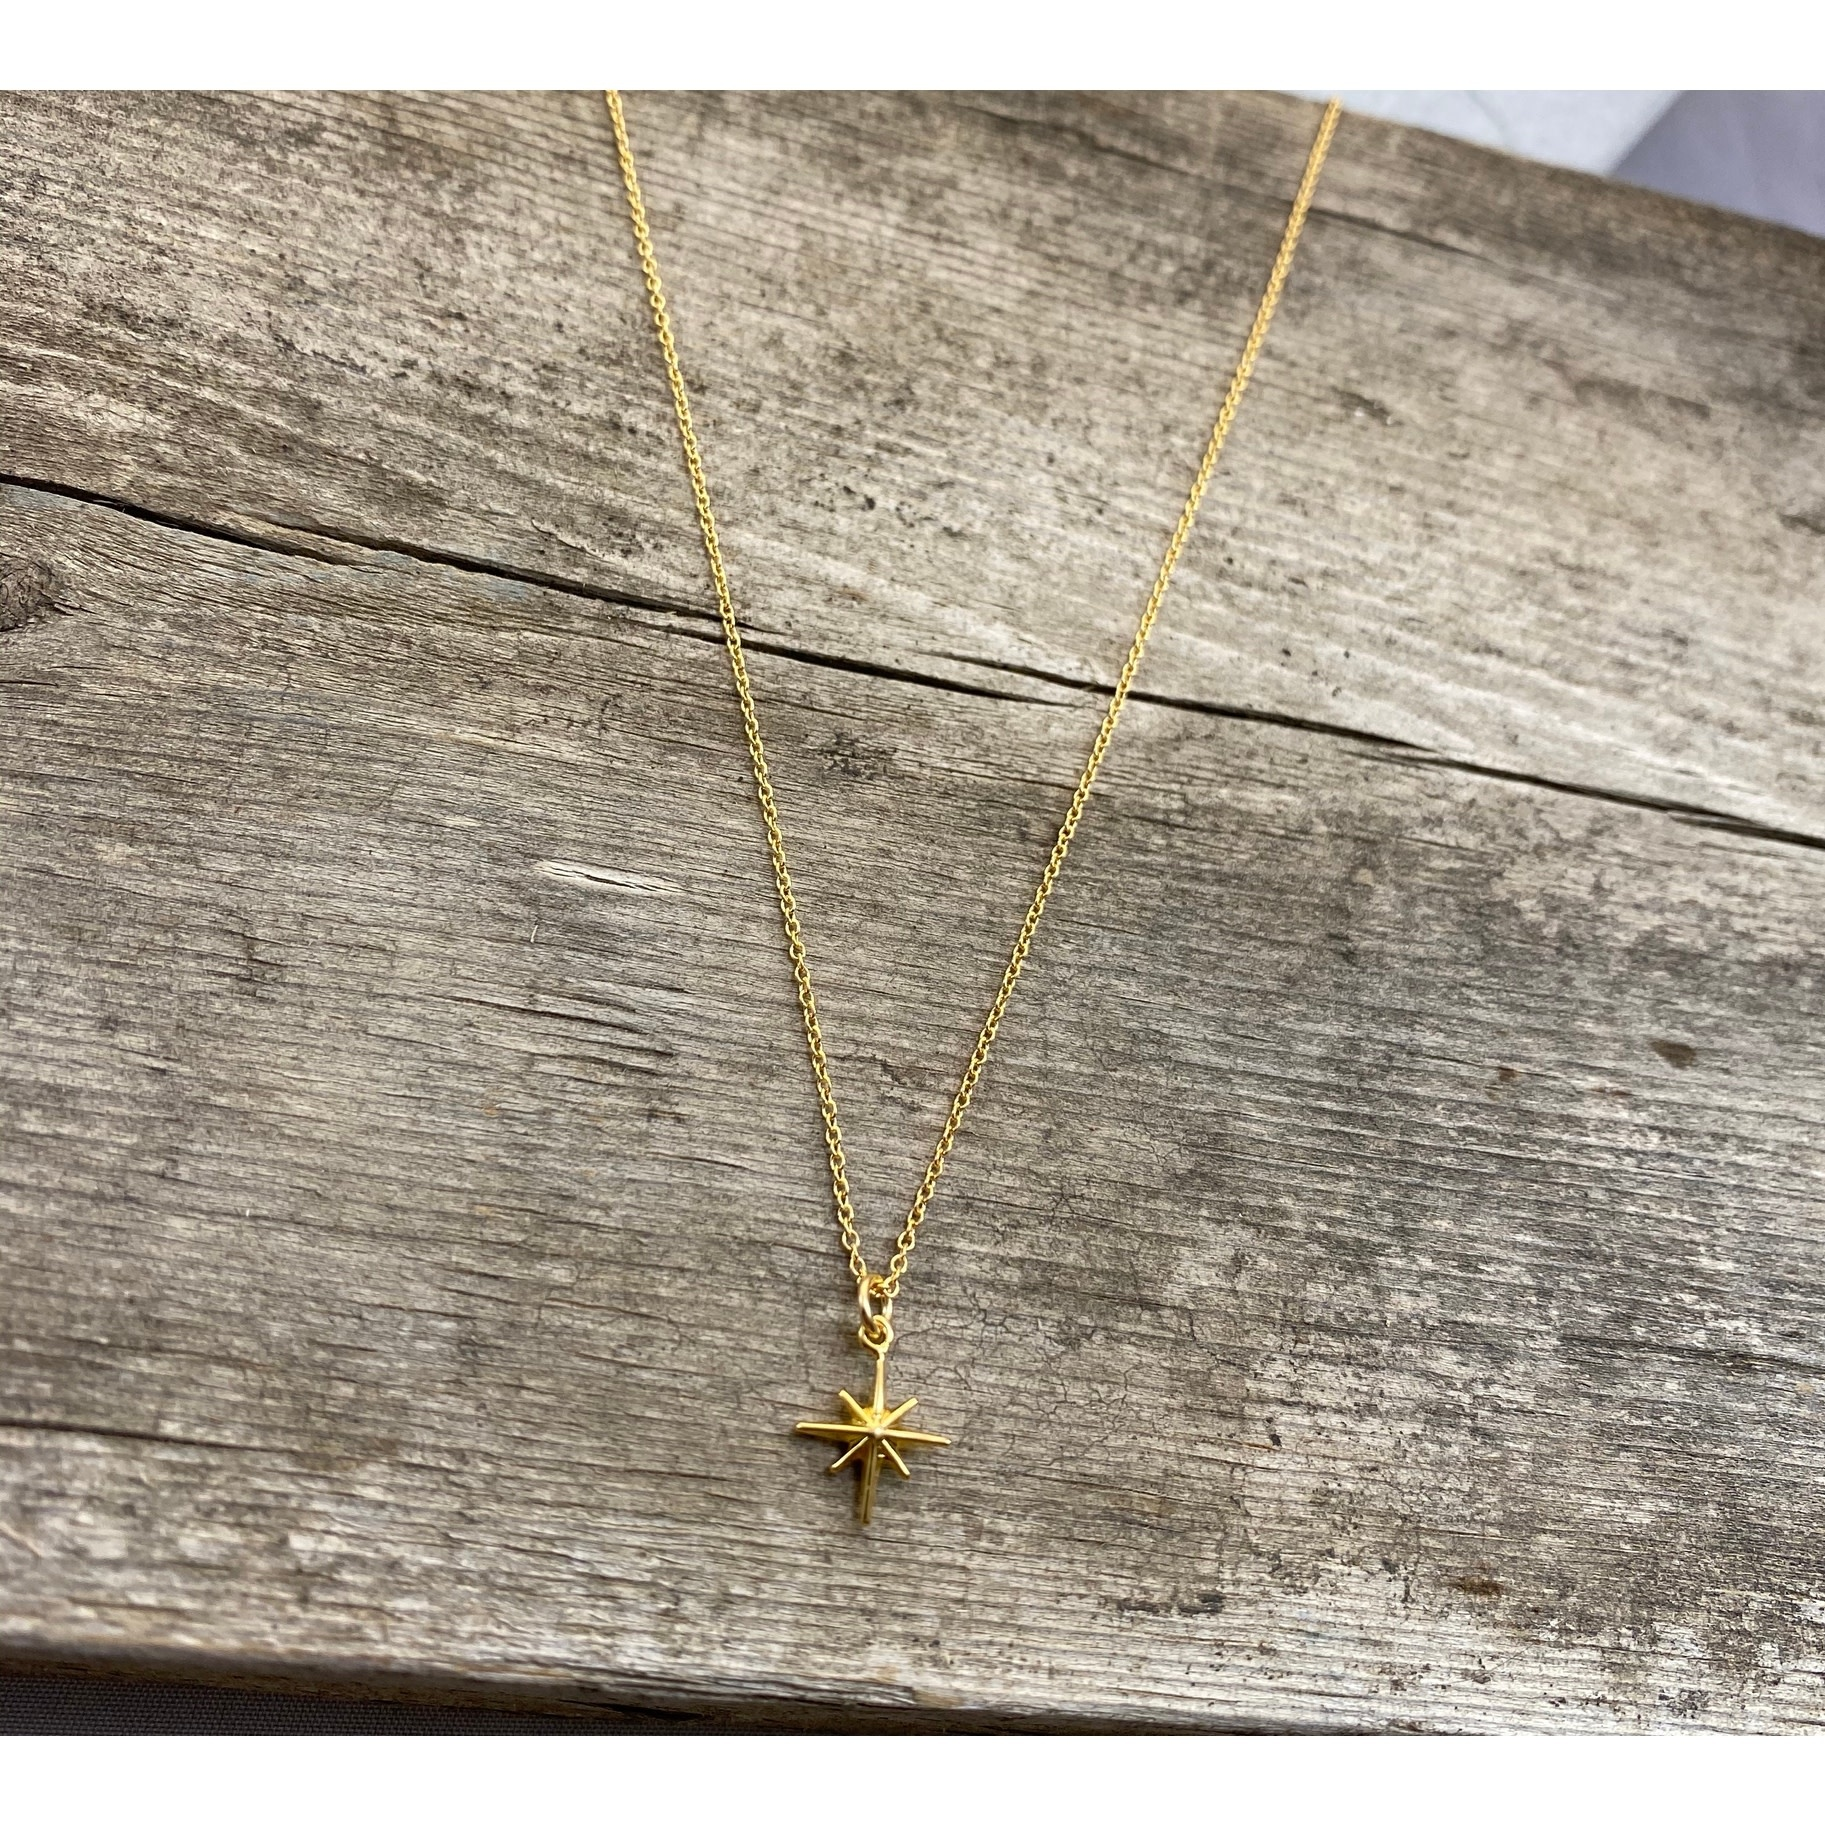 Willa Star Necklace